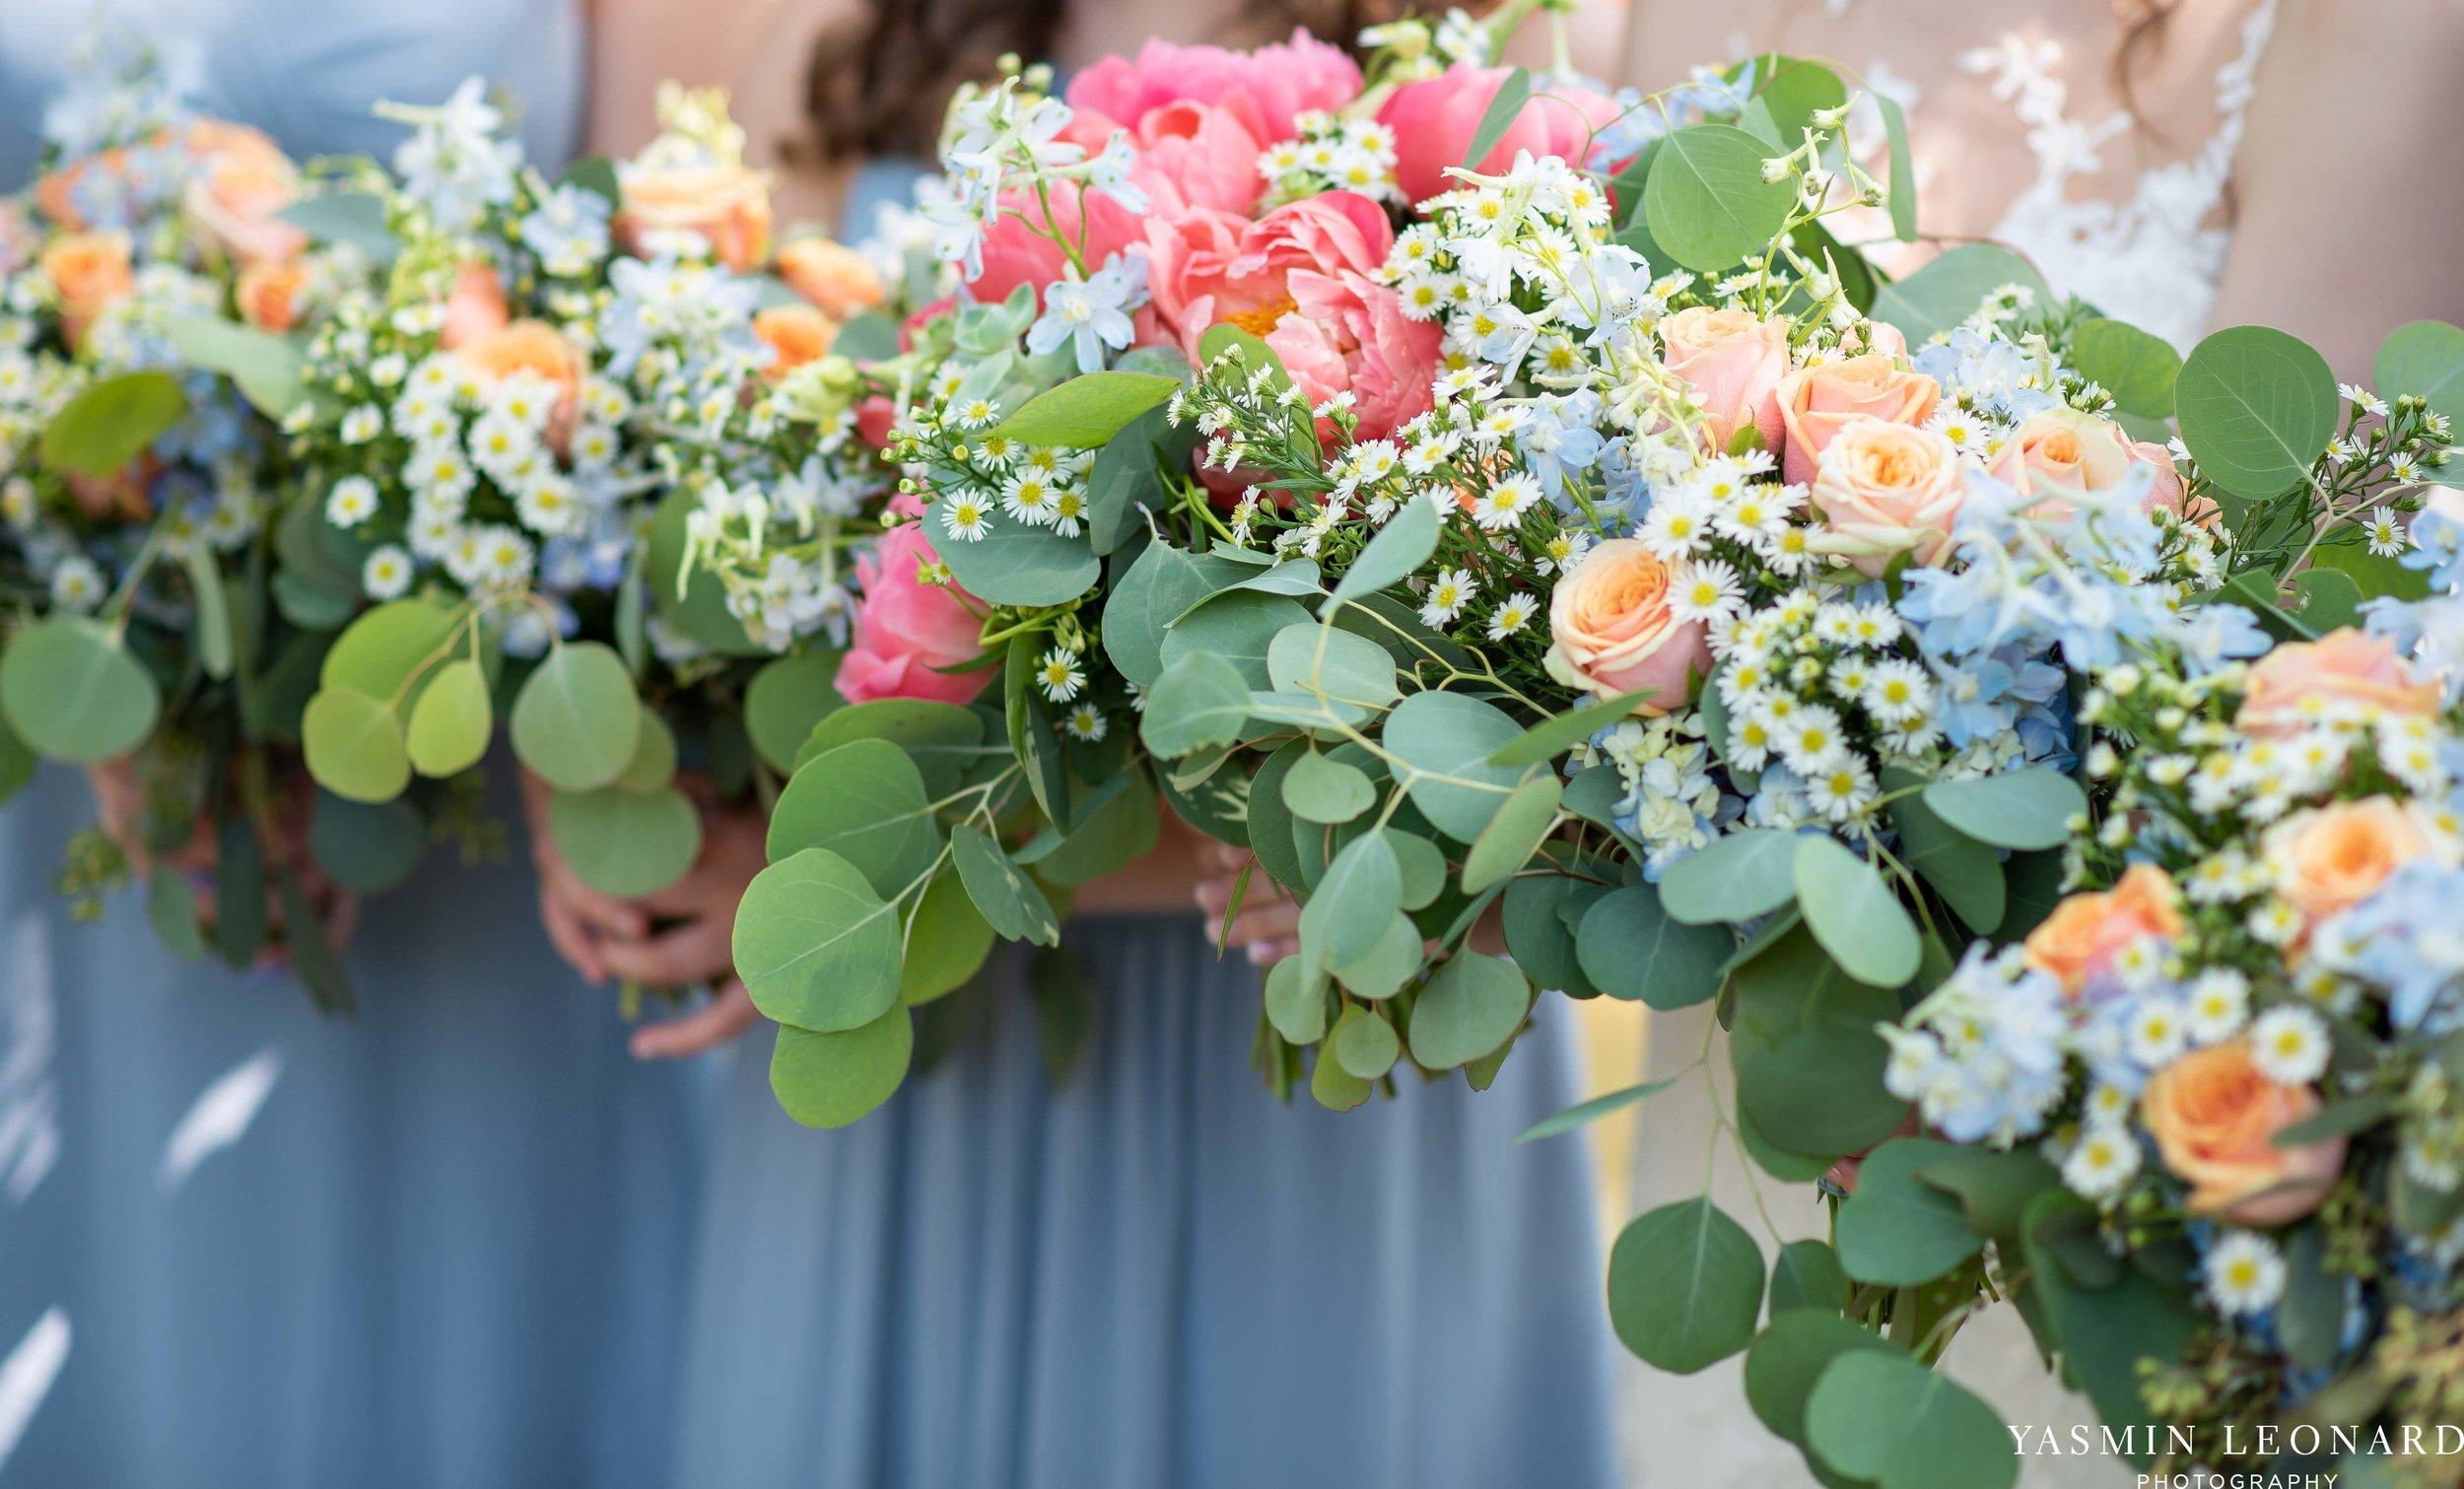 Old Homeplace Vineyard - NC Weddings - Outdoor Summer Weddings - Peony Boutique - Vineyard Wedding - NC Photographer - Yasmin Leonard Photography-21.jpg